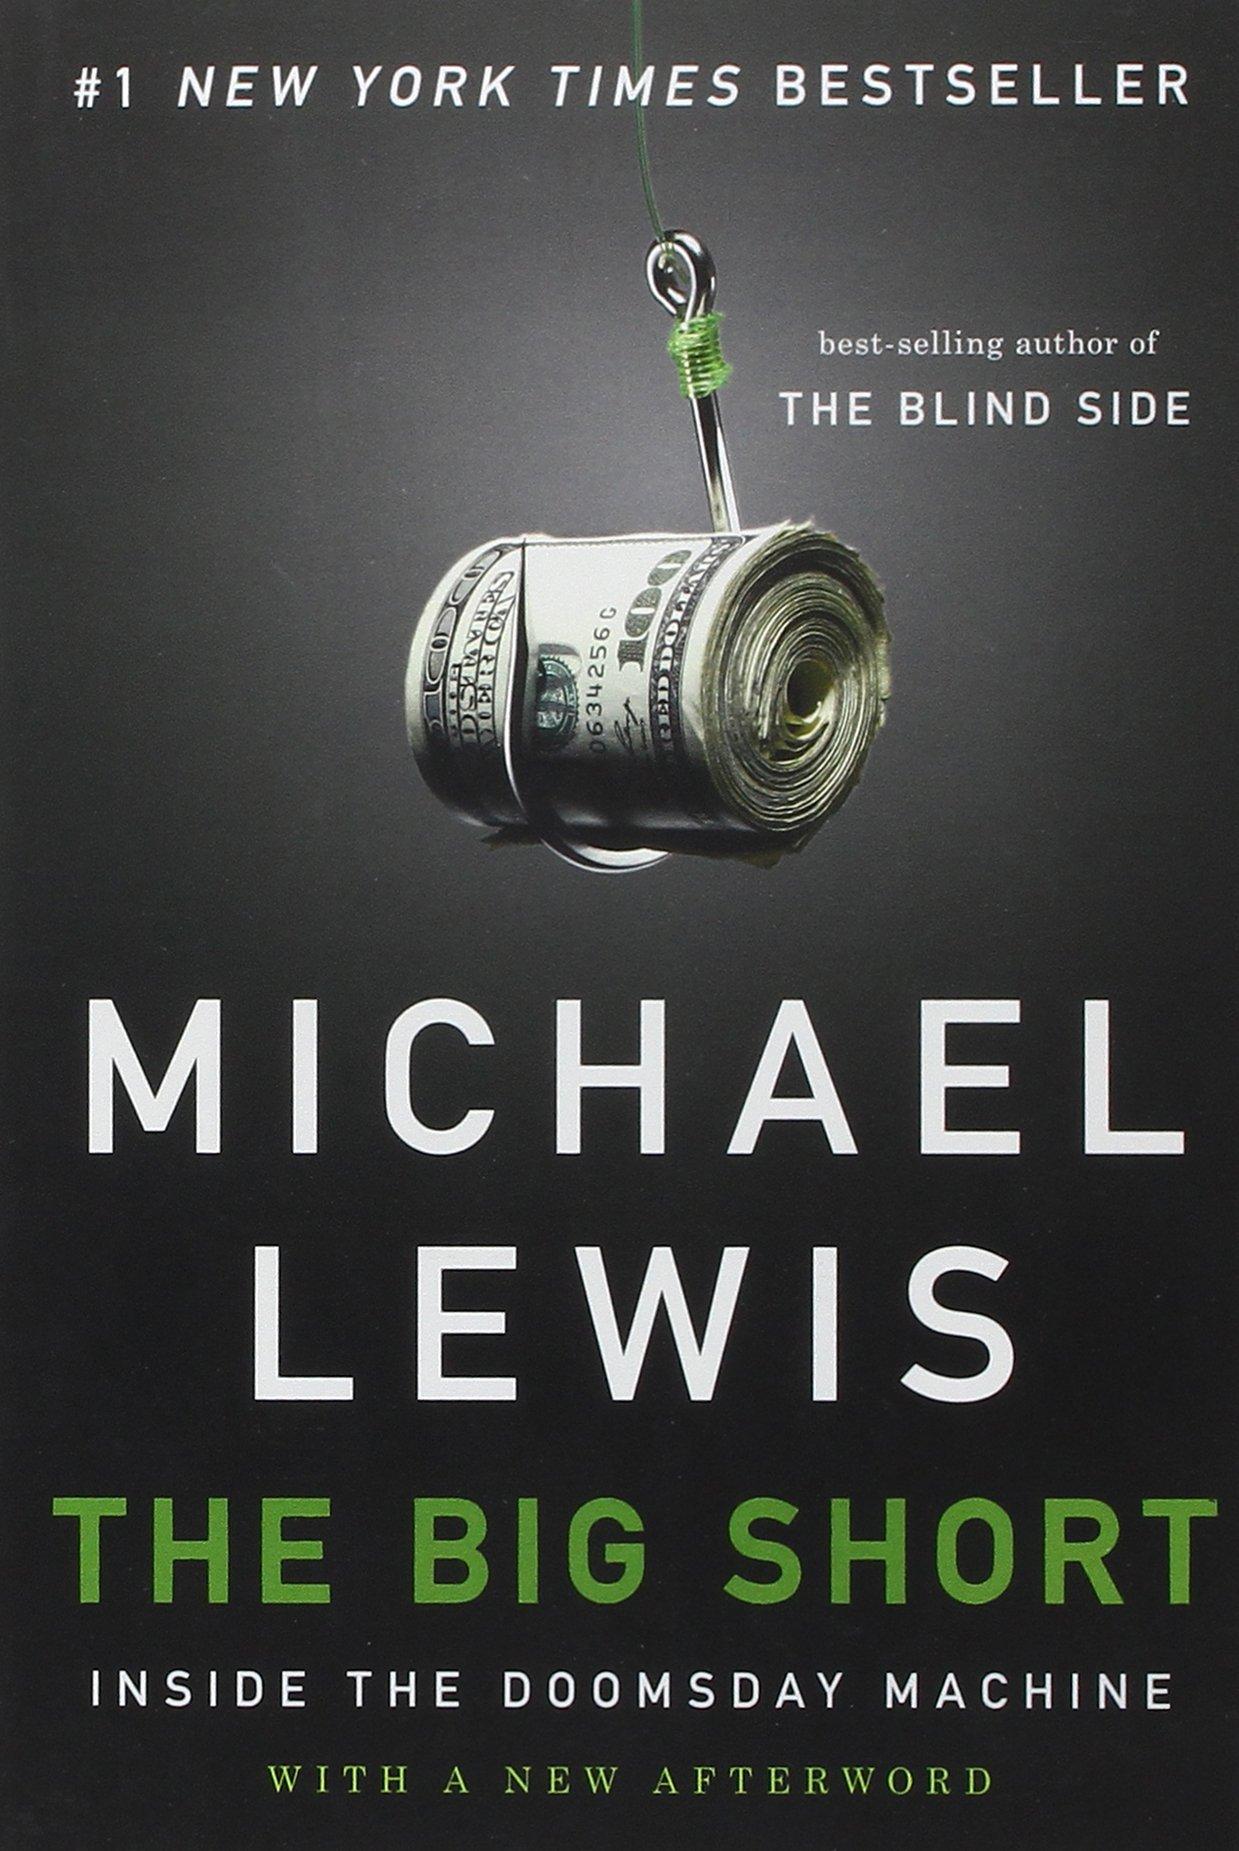 """The Big Short: Inside The Doomsday Machine"""